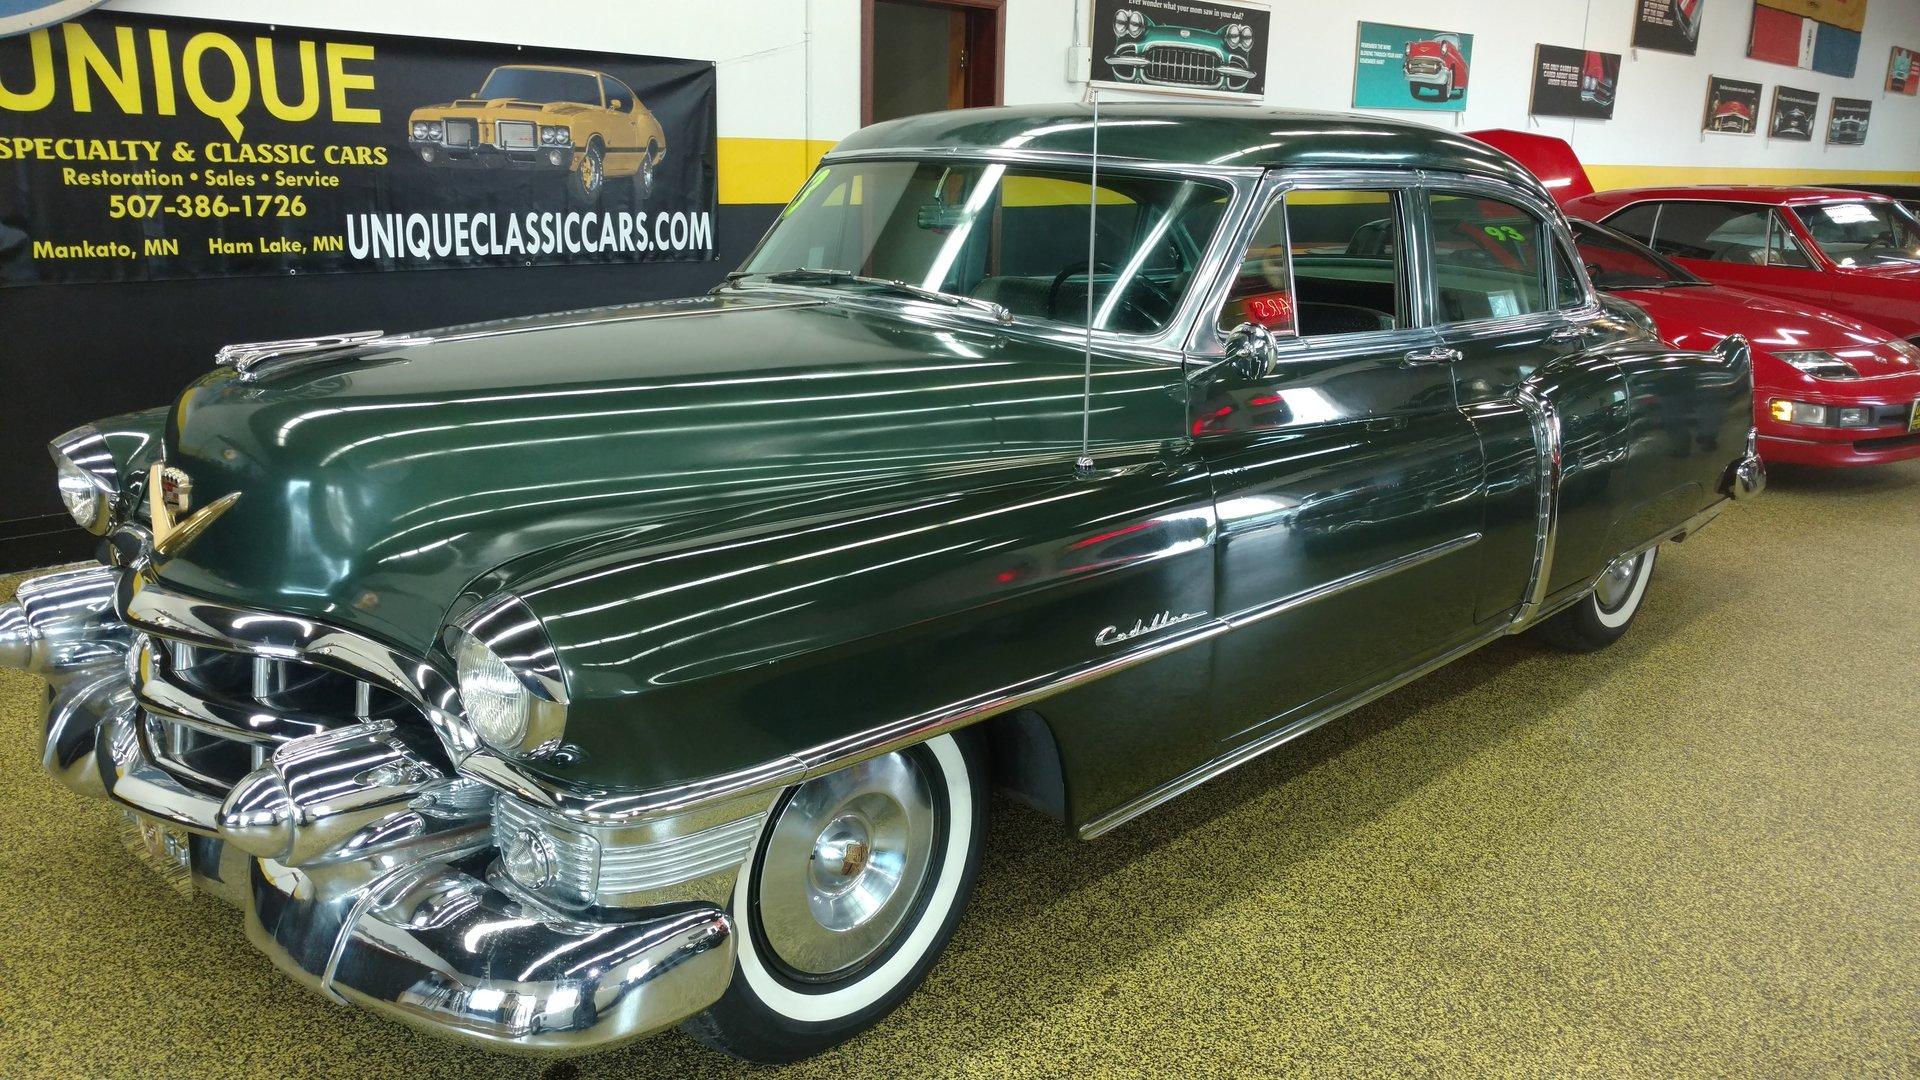 1953 Cadillac Series 62 Sedan for sale #65367 | MCG